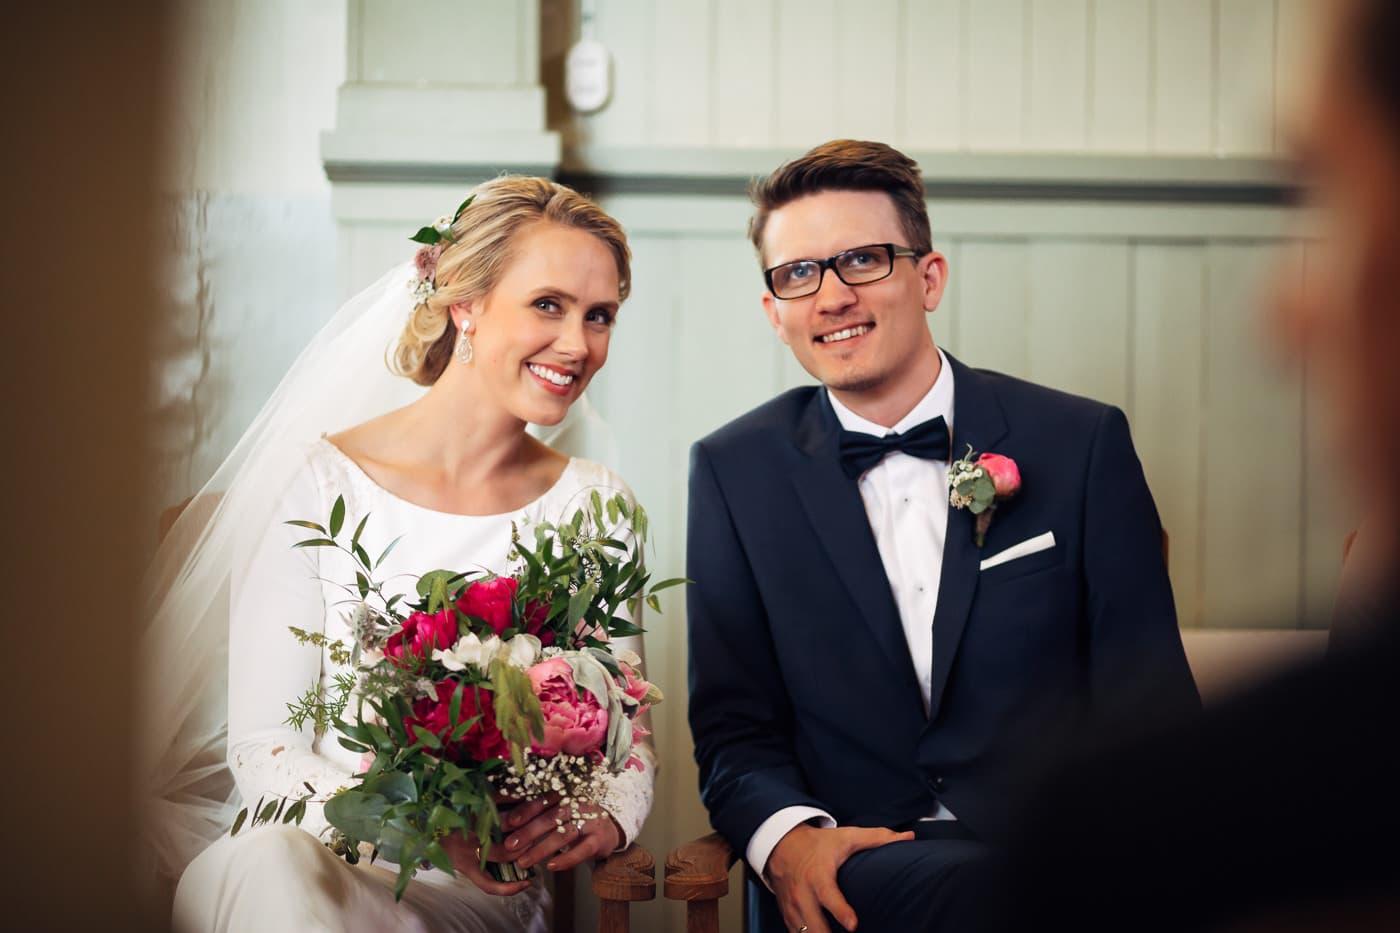 Karoline & Andreas - bryllup i Østfold med magiske detaljer Bryllup Fredrikstad Fotograf 25